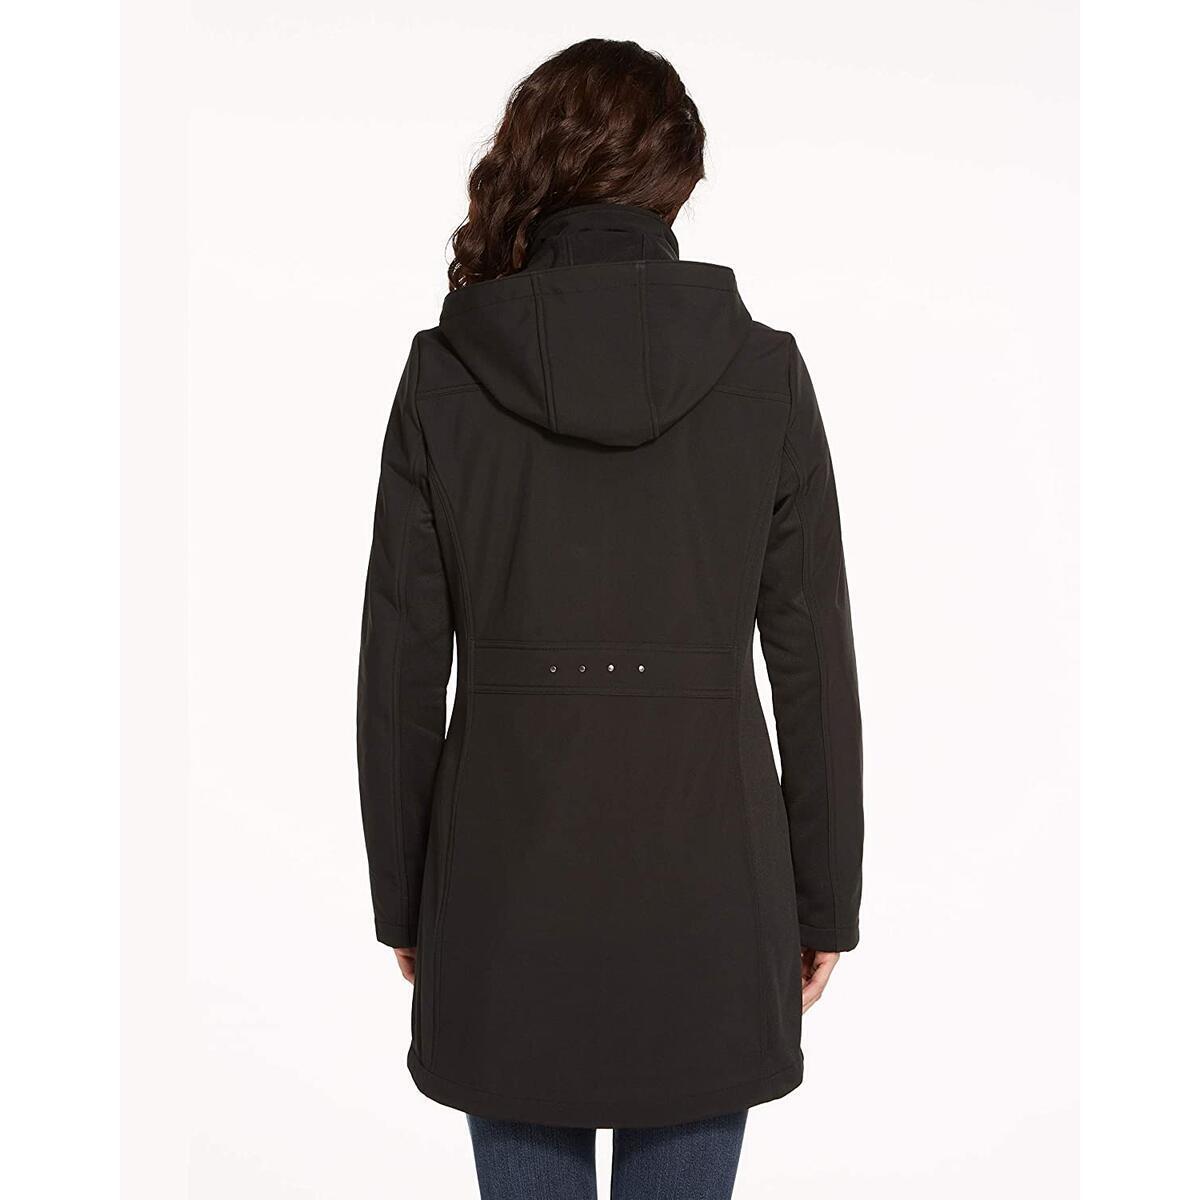 Weatherproof Womens Raincoat Lightweight Softshell Water Resistant Rain Jacket with Detachable Hood